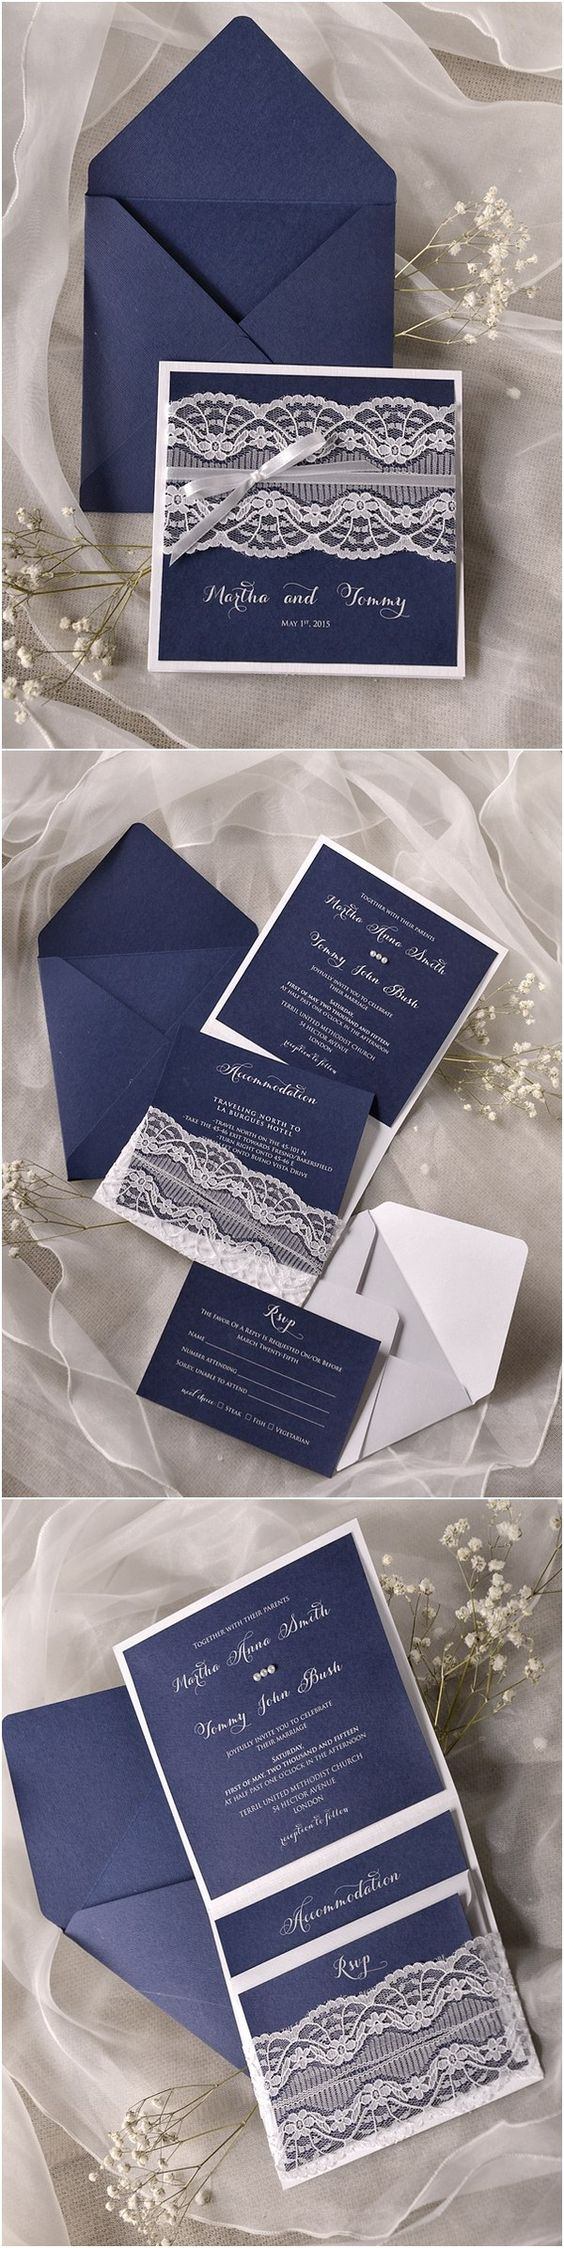 nautical wedding invitations uk%0A Navy blue Lace Wedding Invitations   LOVEPolkaDots   Wedding Invitations    Pinterest   Lace weddings  Navy blue and Navy